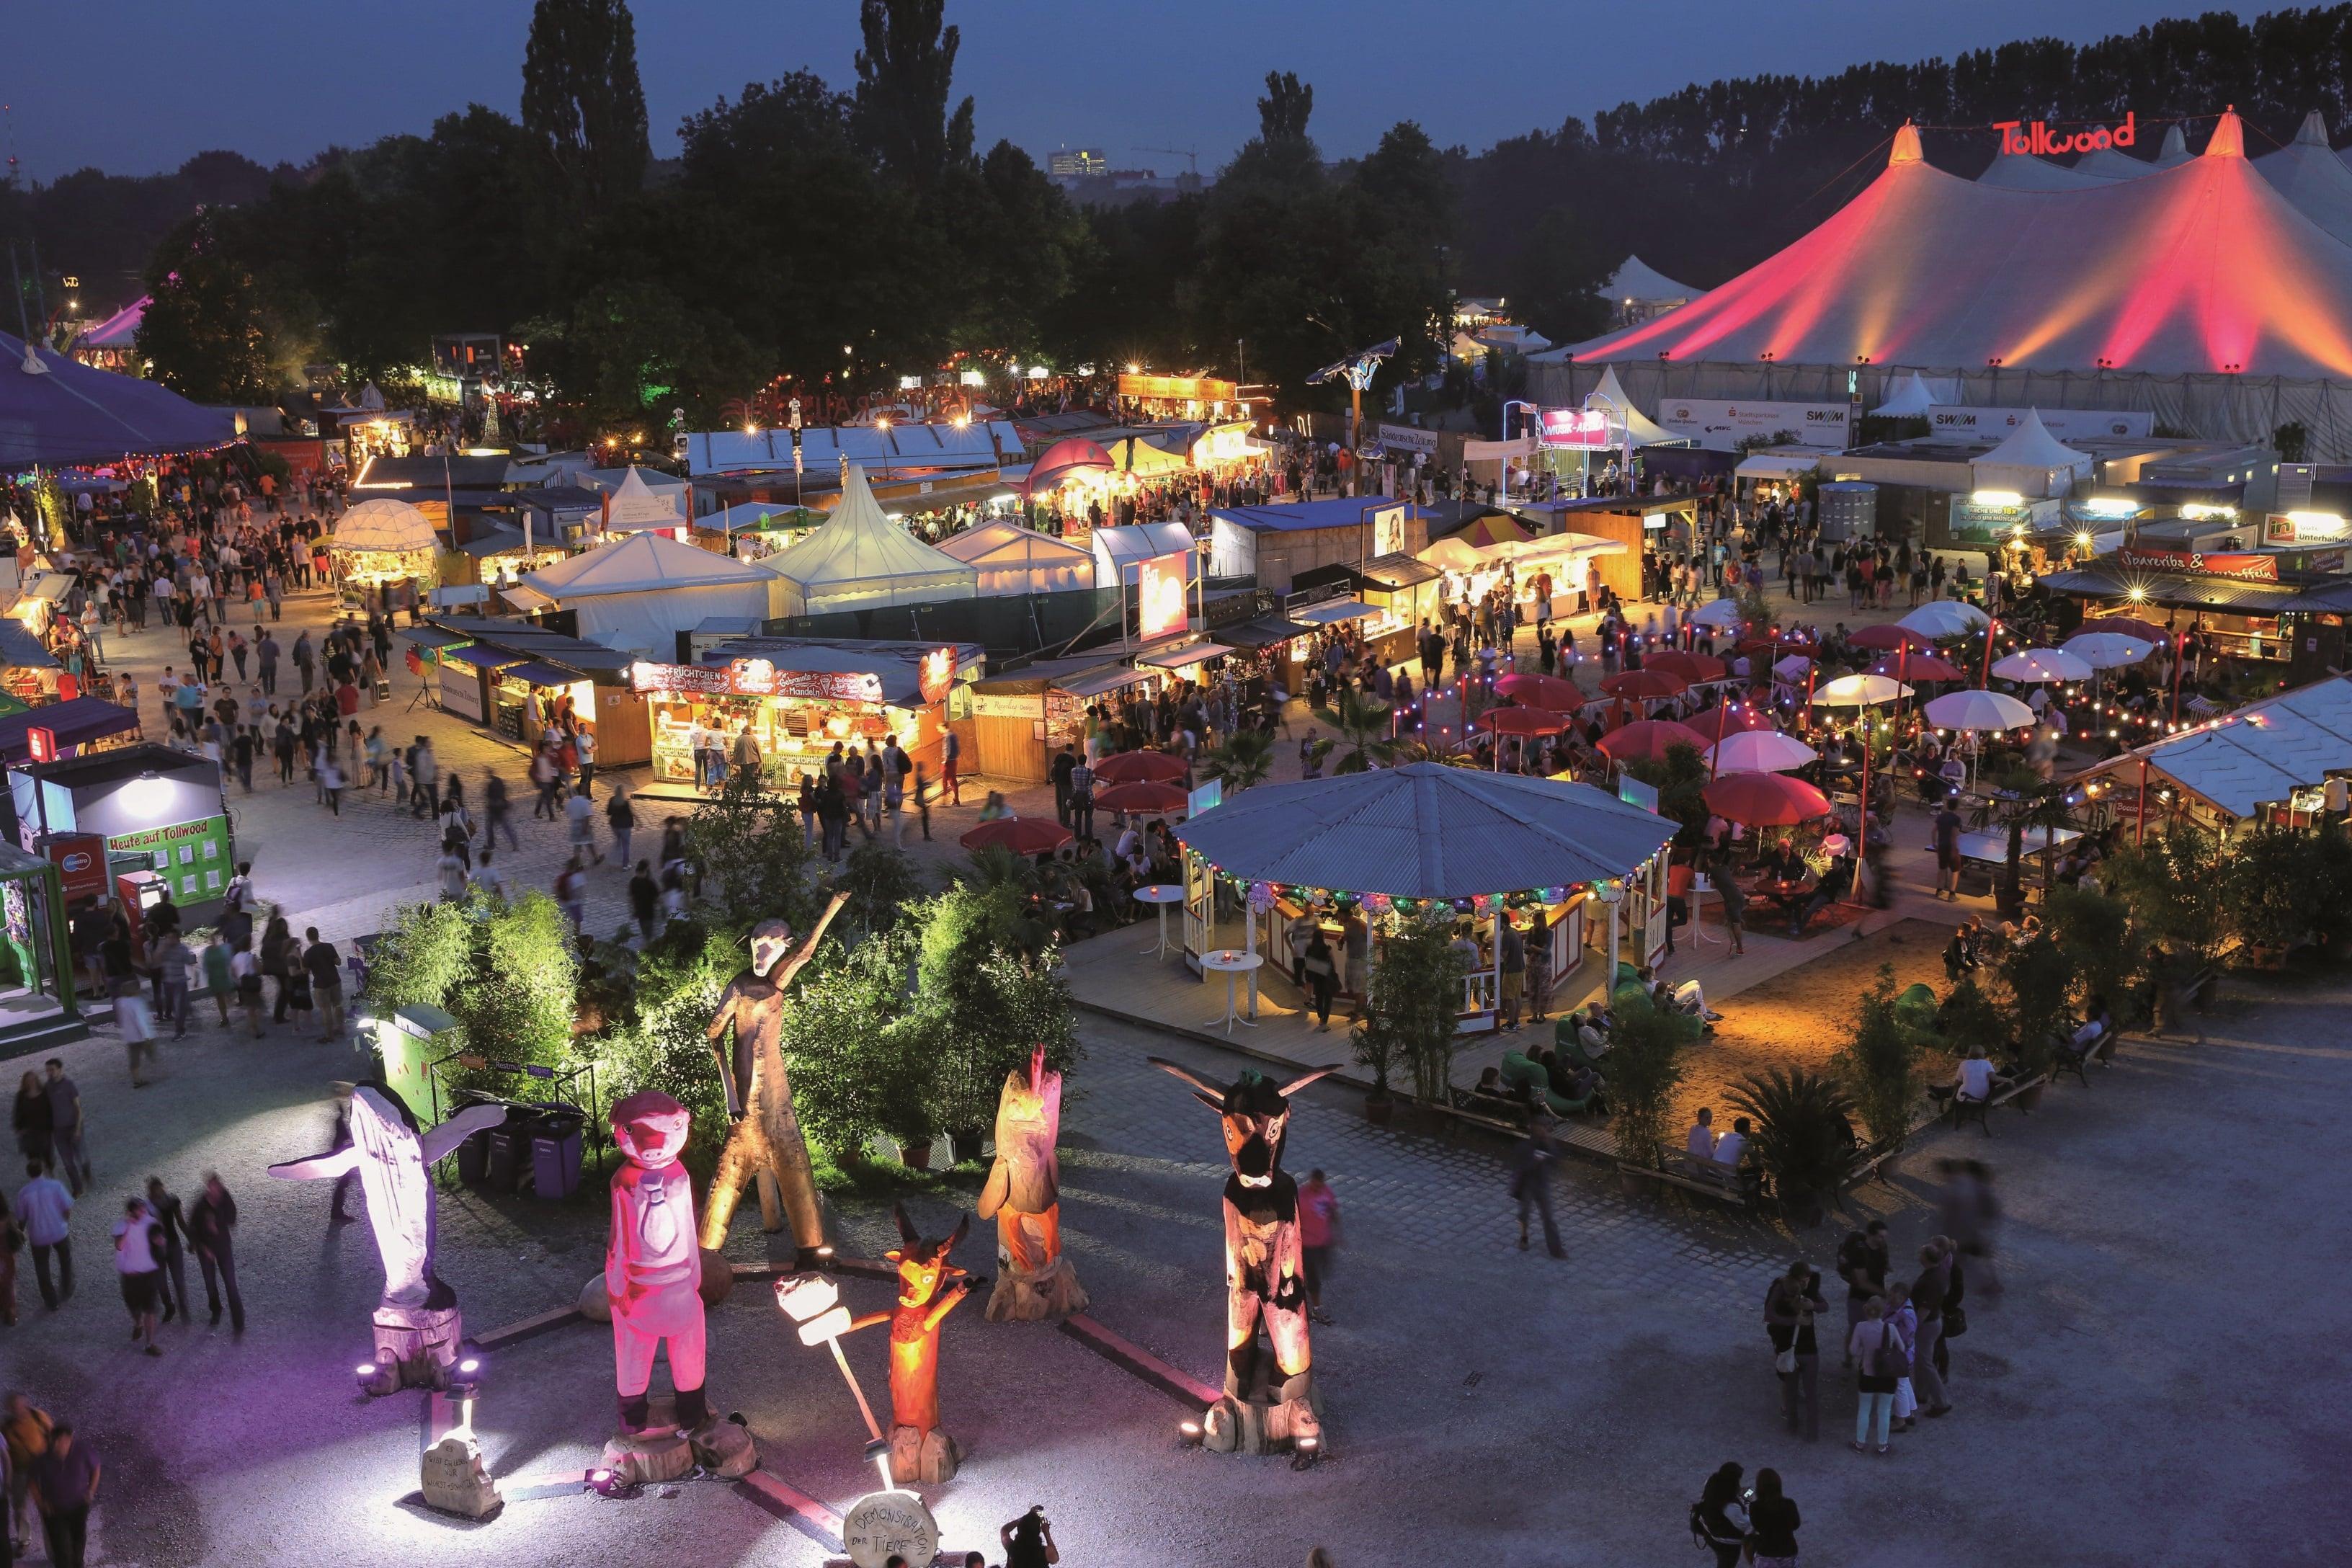 Bedrijfswinterfestival op jullie bedrijf met eigen kerstmarkt